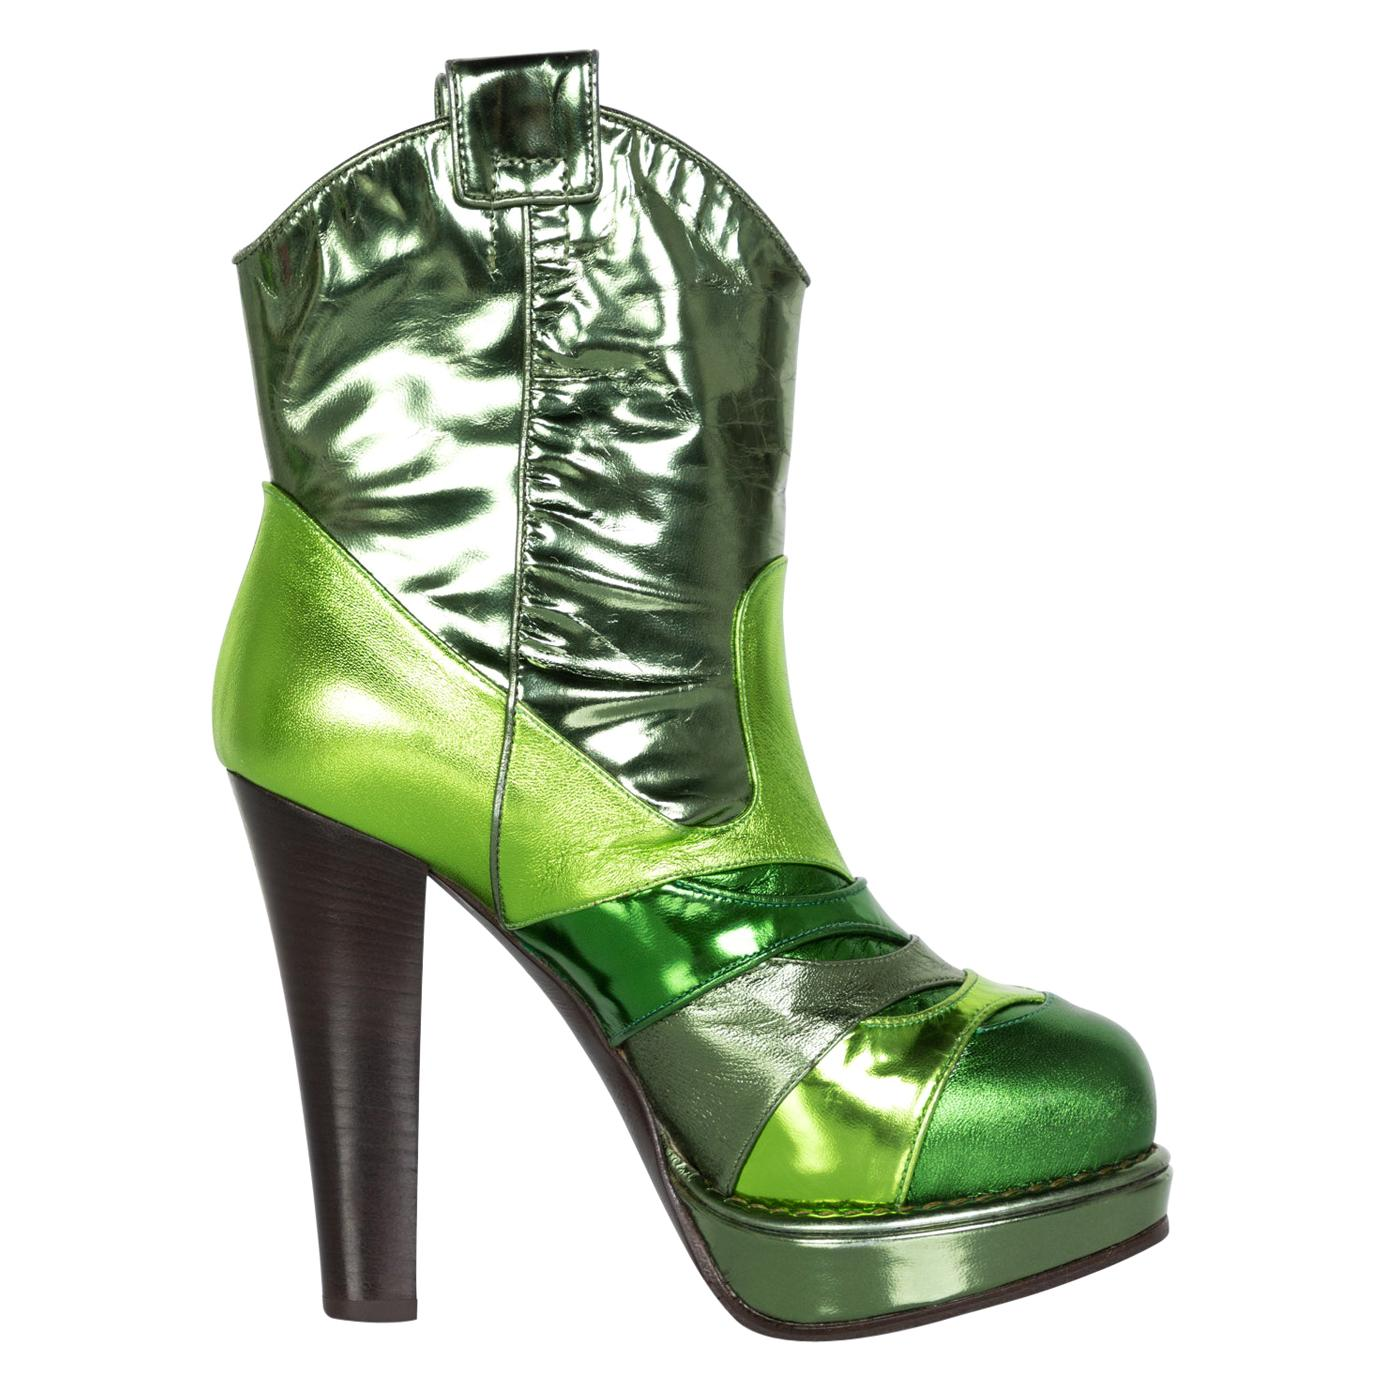 Bottega Veneta Metallic Green Leather Ankle Boots, 2010